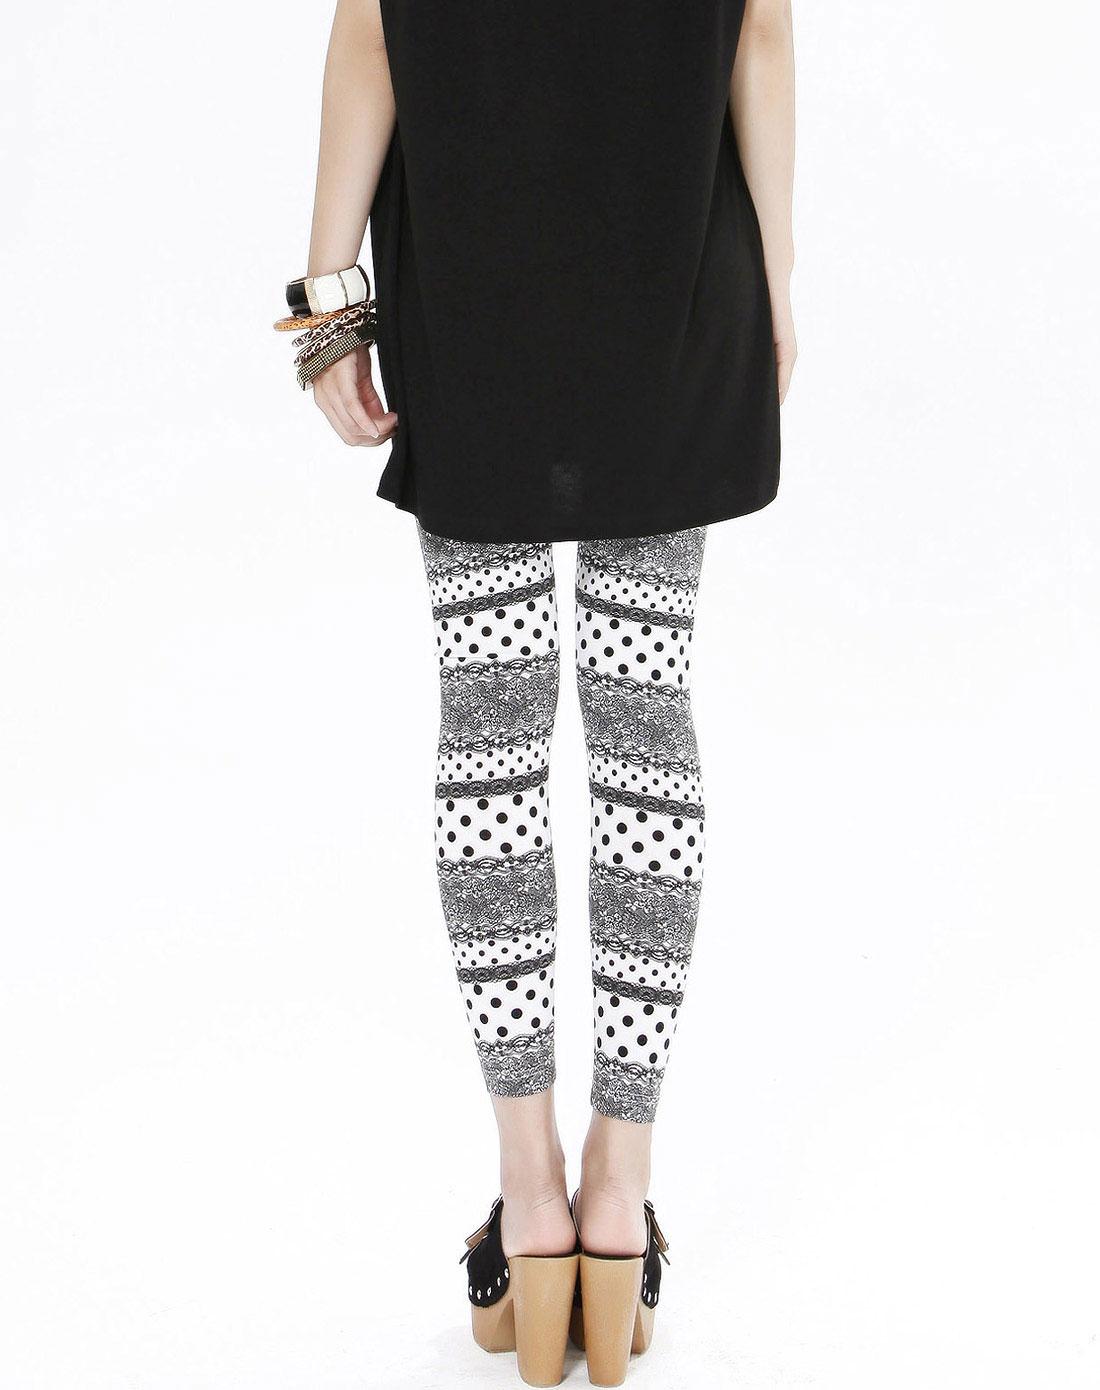 color女黑白花纹黑白花纹打底裤t1k39909